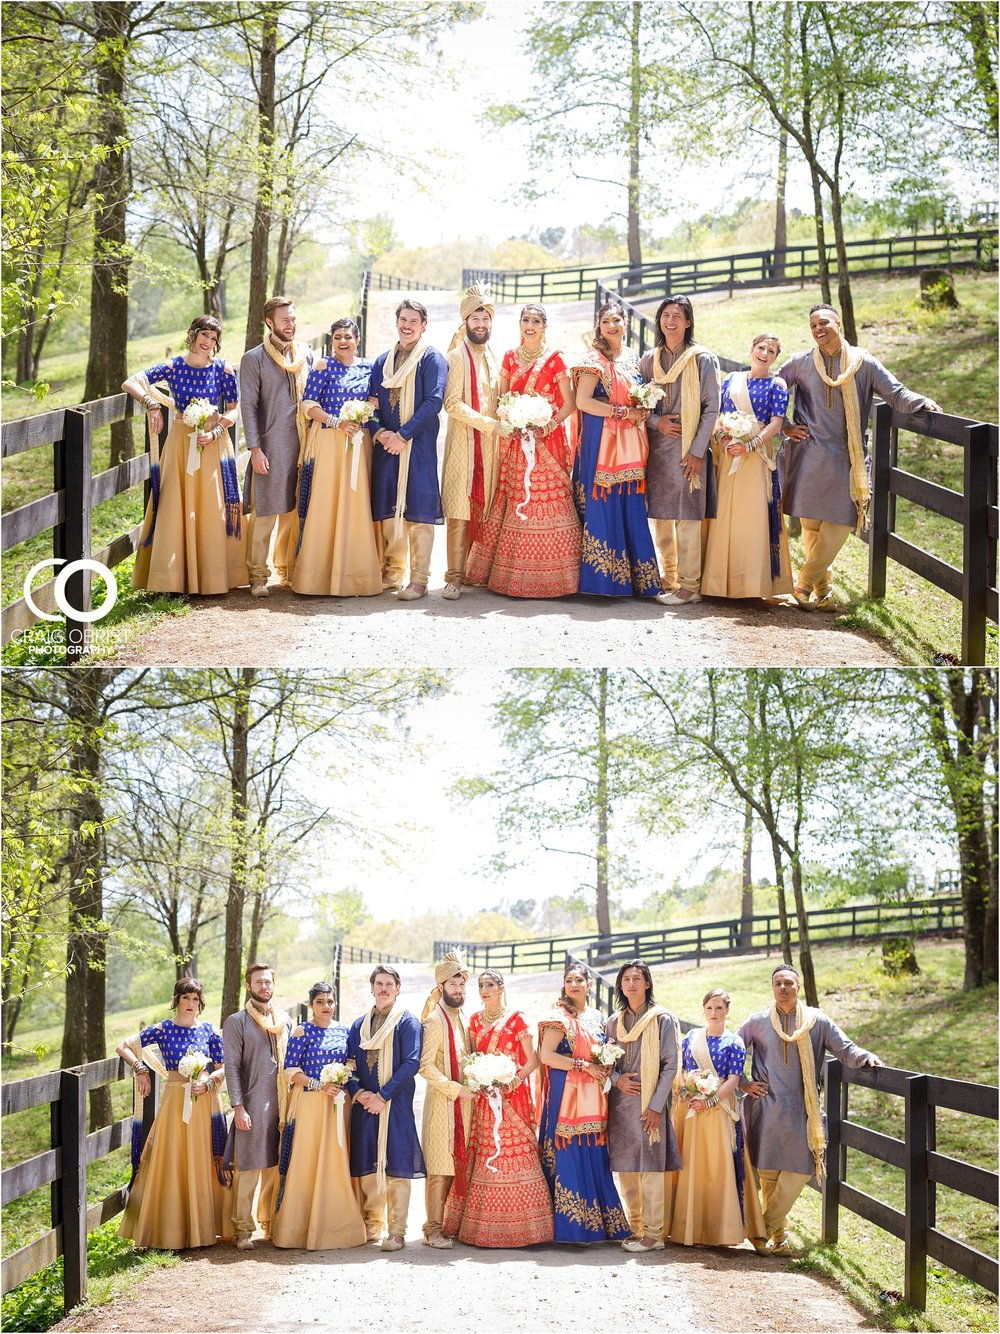 Chukkar Farm Polo Club Events & Weddings Craig Obrist_0044.jpg